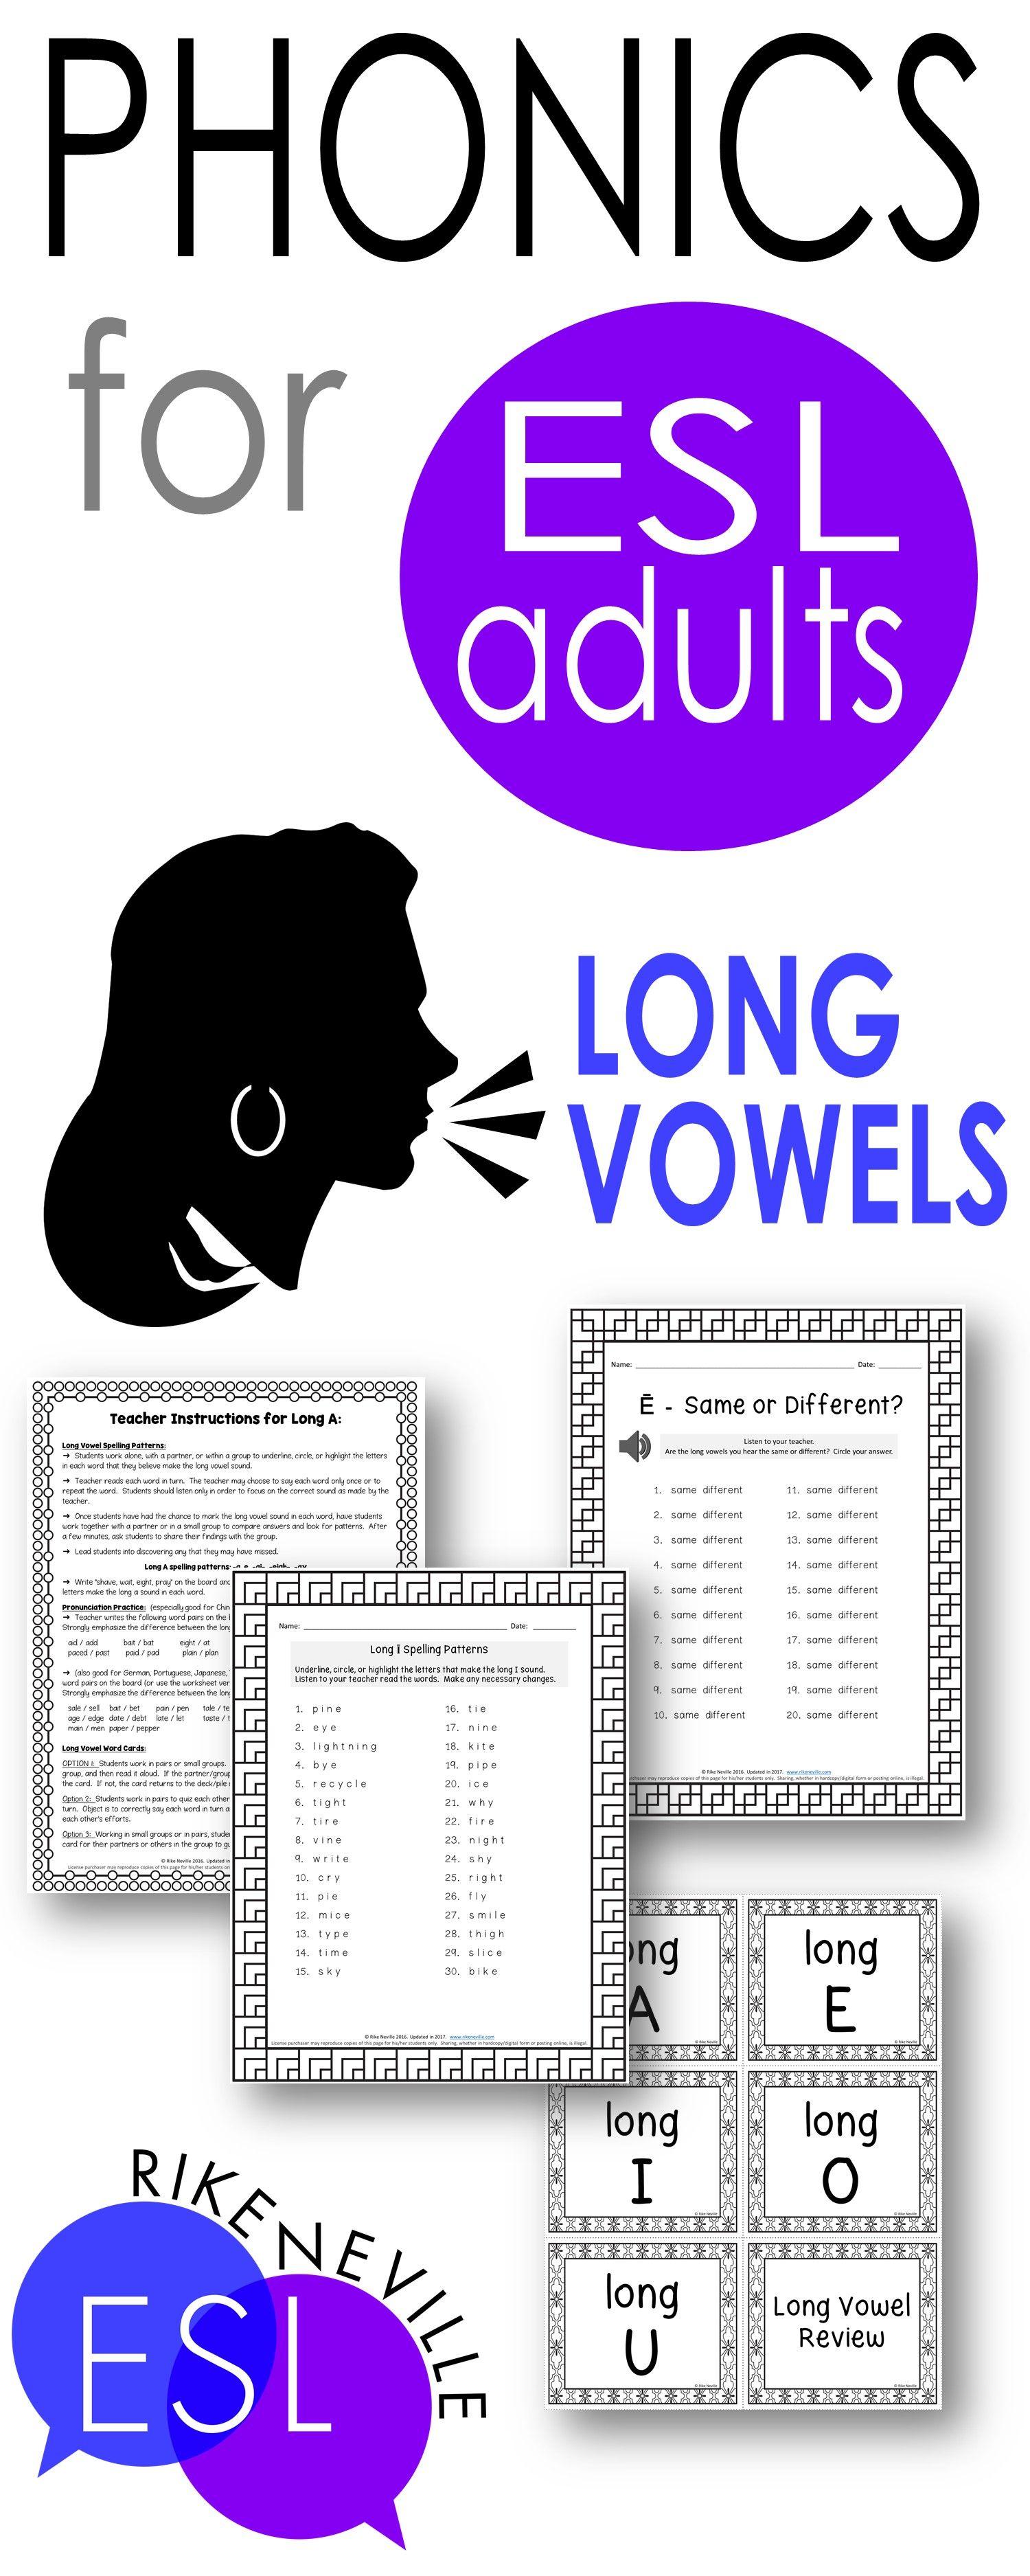 Adult program phonics spelling picture 622